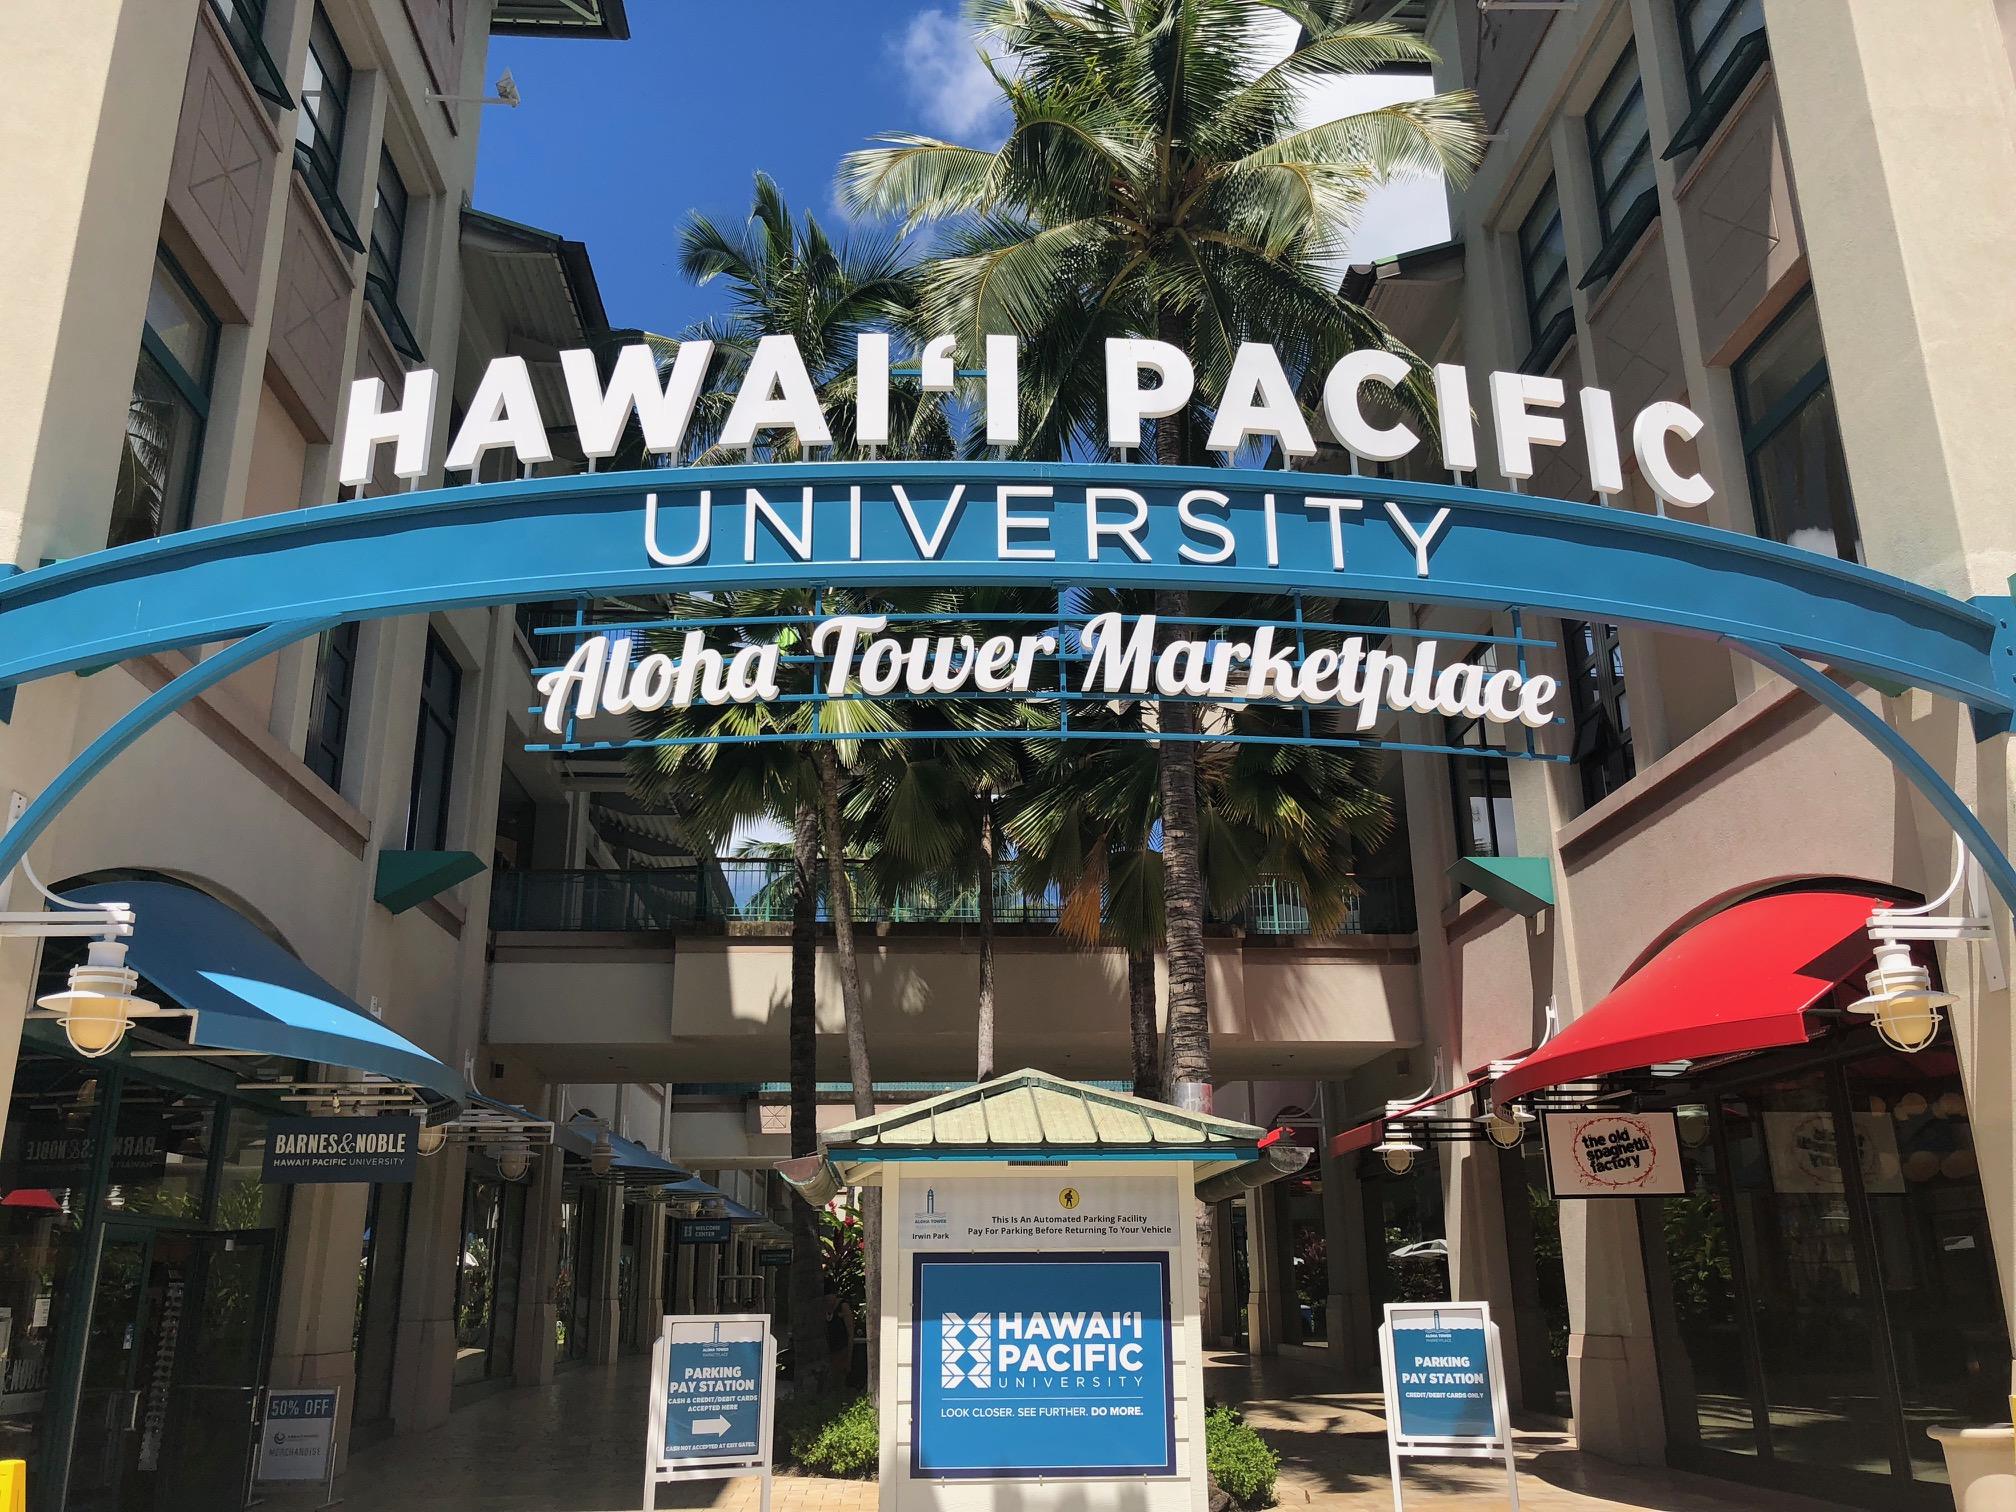 Hawaii Pacific